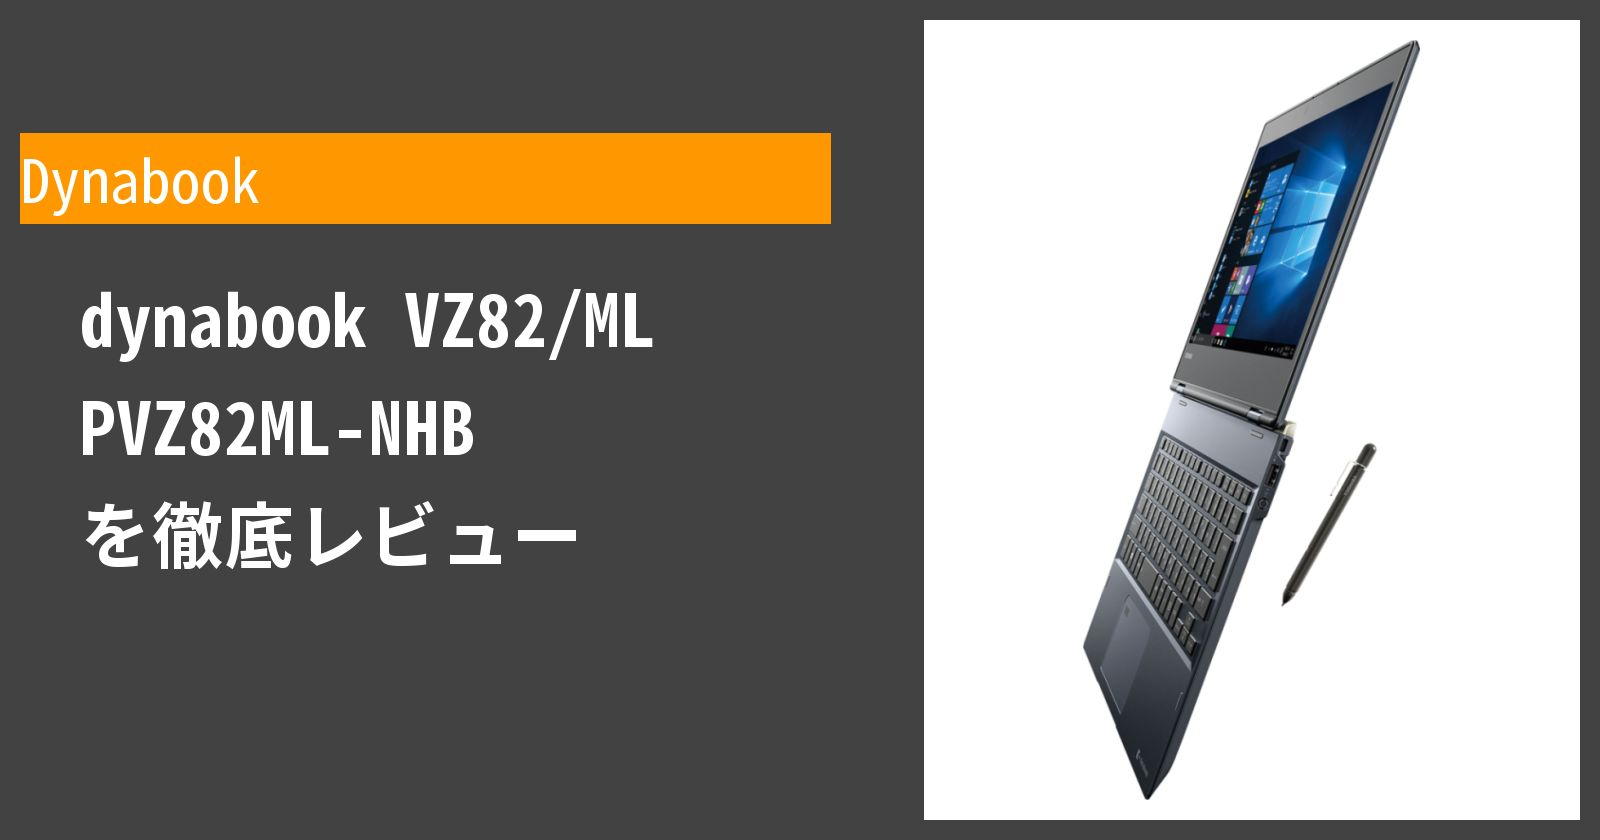 dynabook VZ82/ML PVZ82ML-NHBを徹底評価